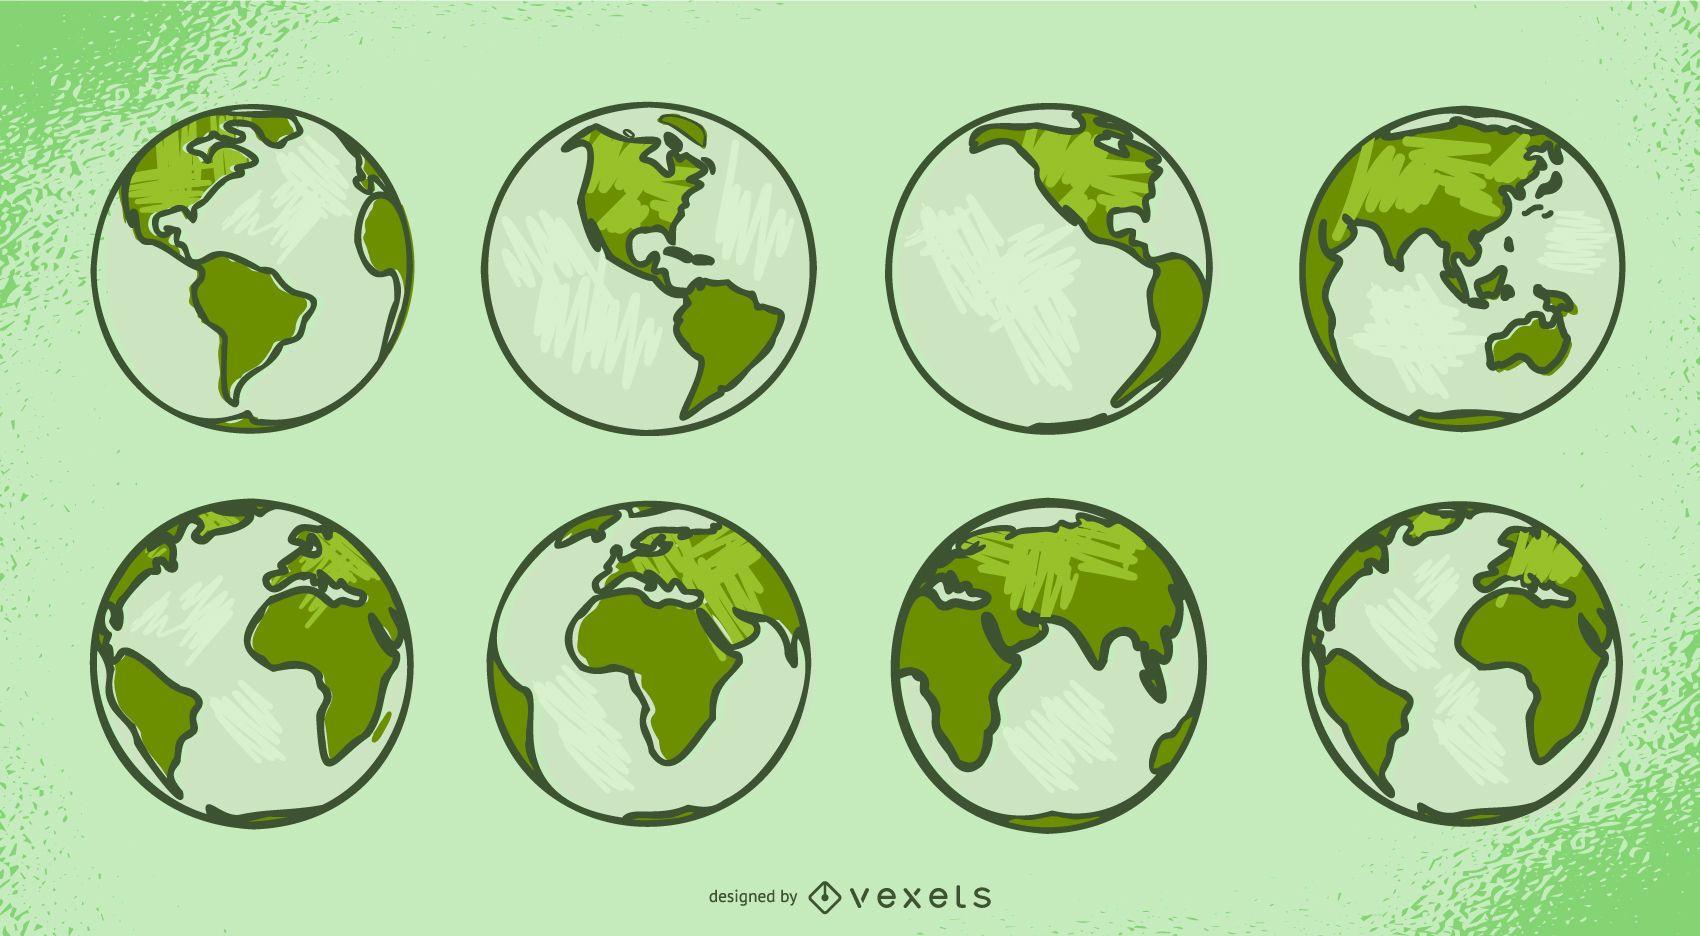 Green Earth Object Illustration Set